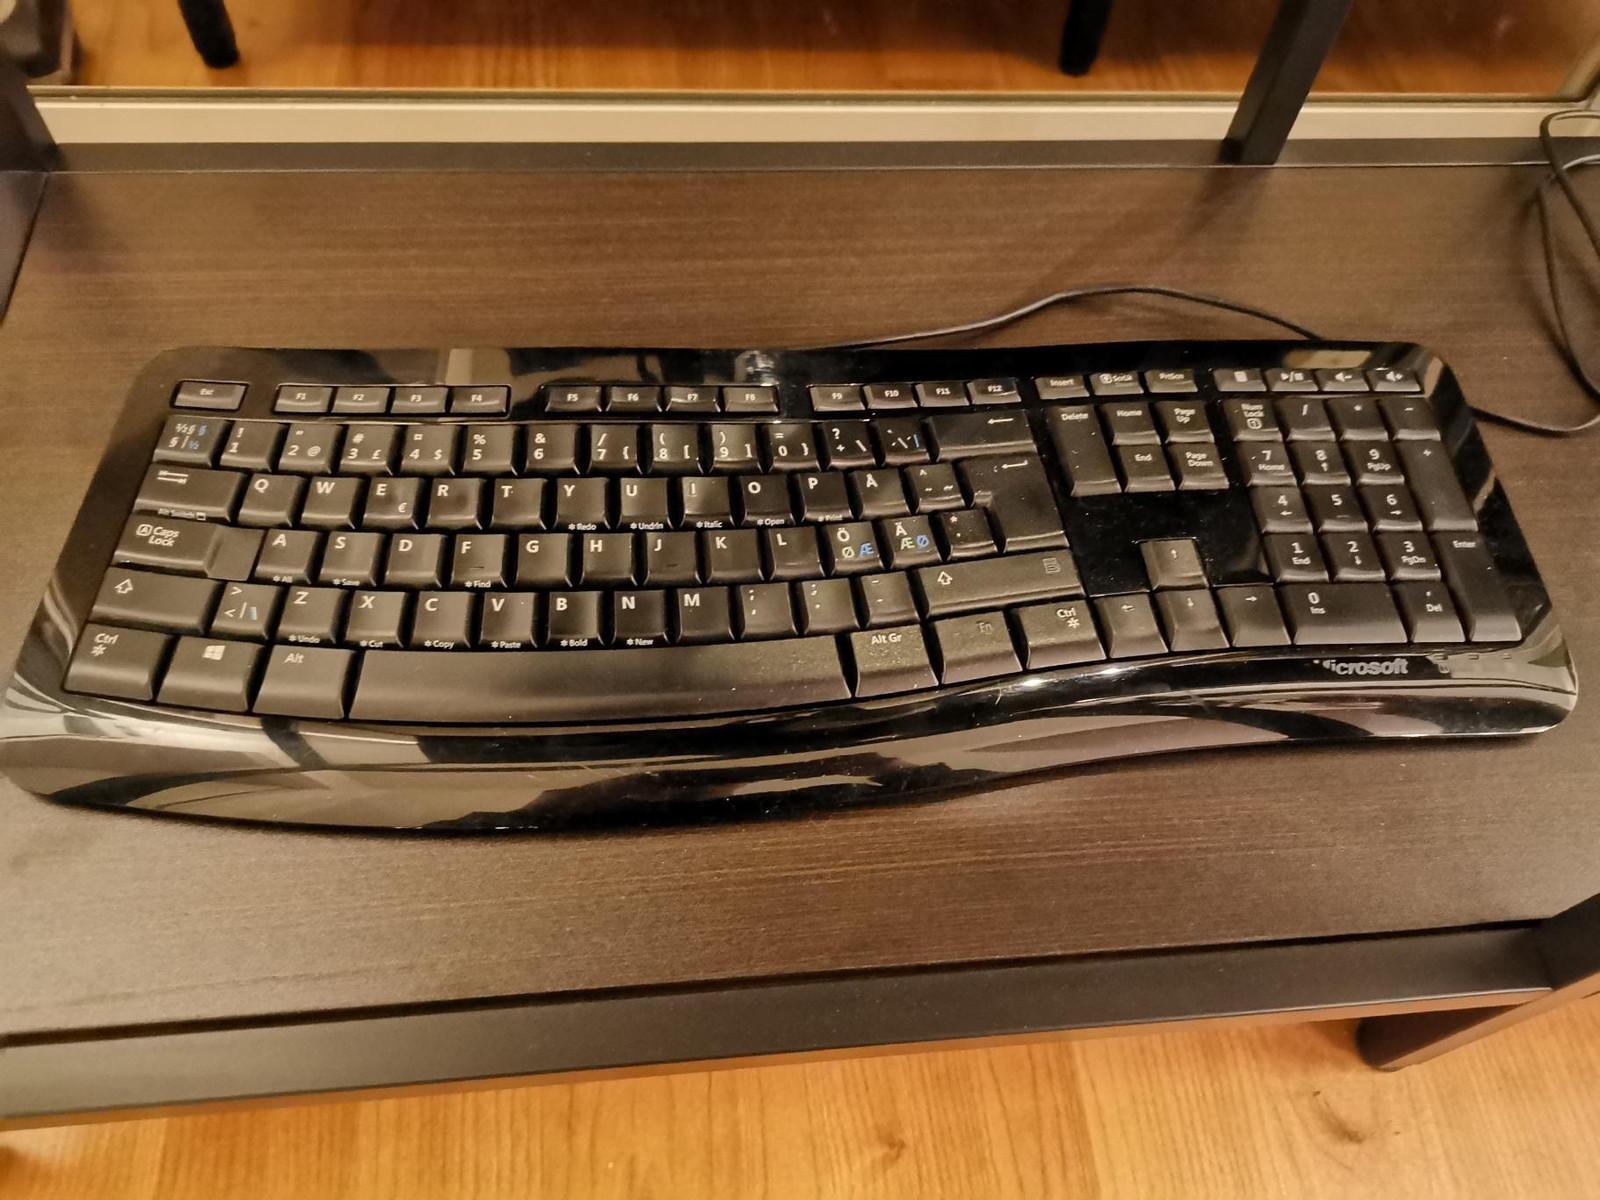 Microsoft comfort curve keyboard 3000 | FINN.no